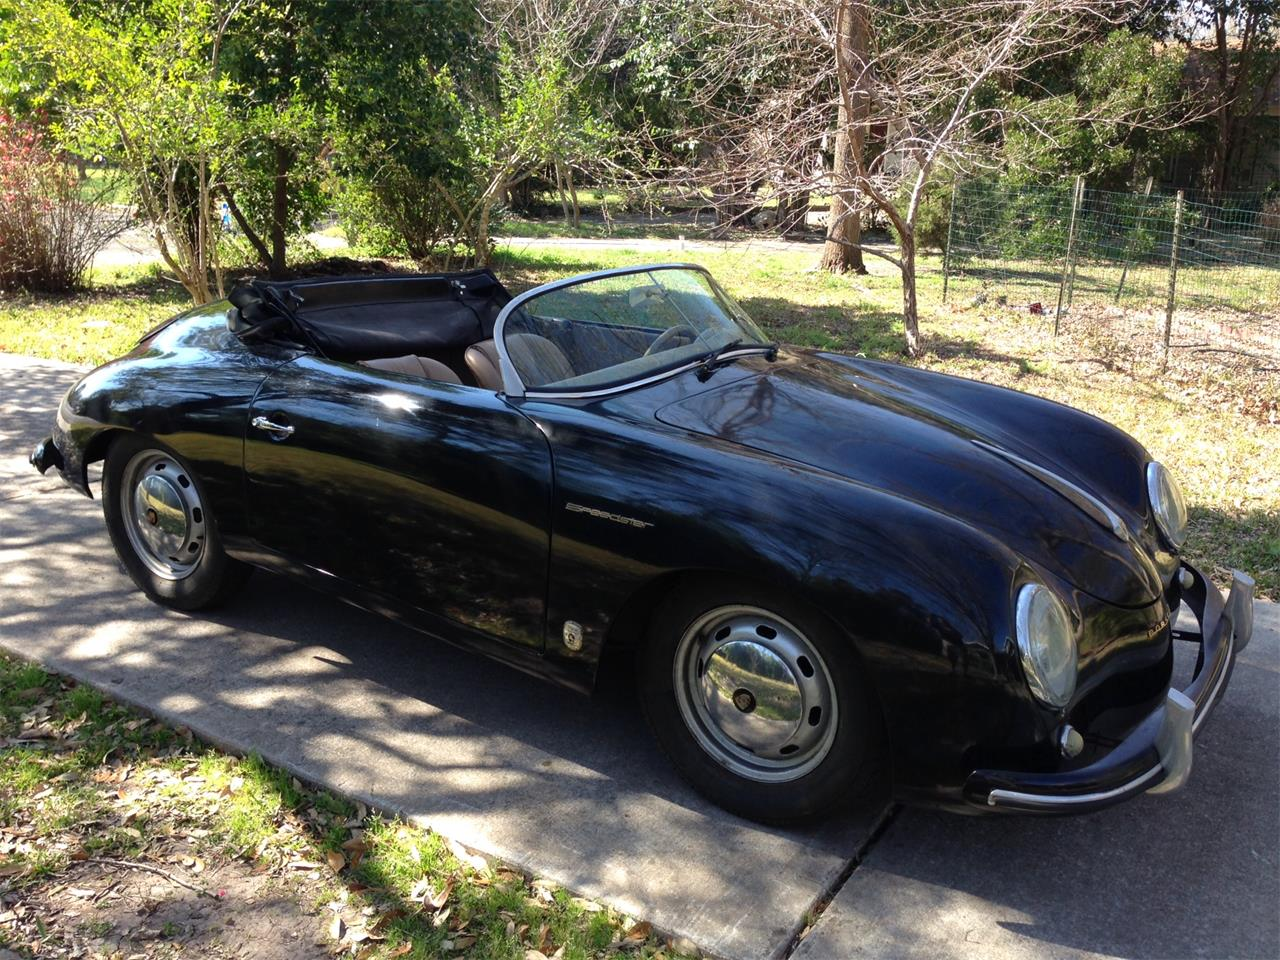 porsche 356 1965 texas classic cc classiccars austin financing inspection insurance transport